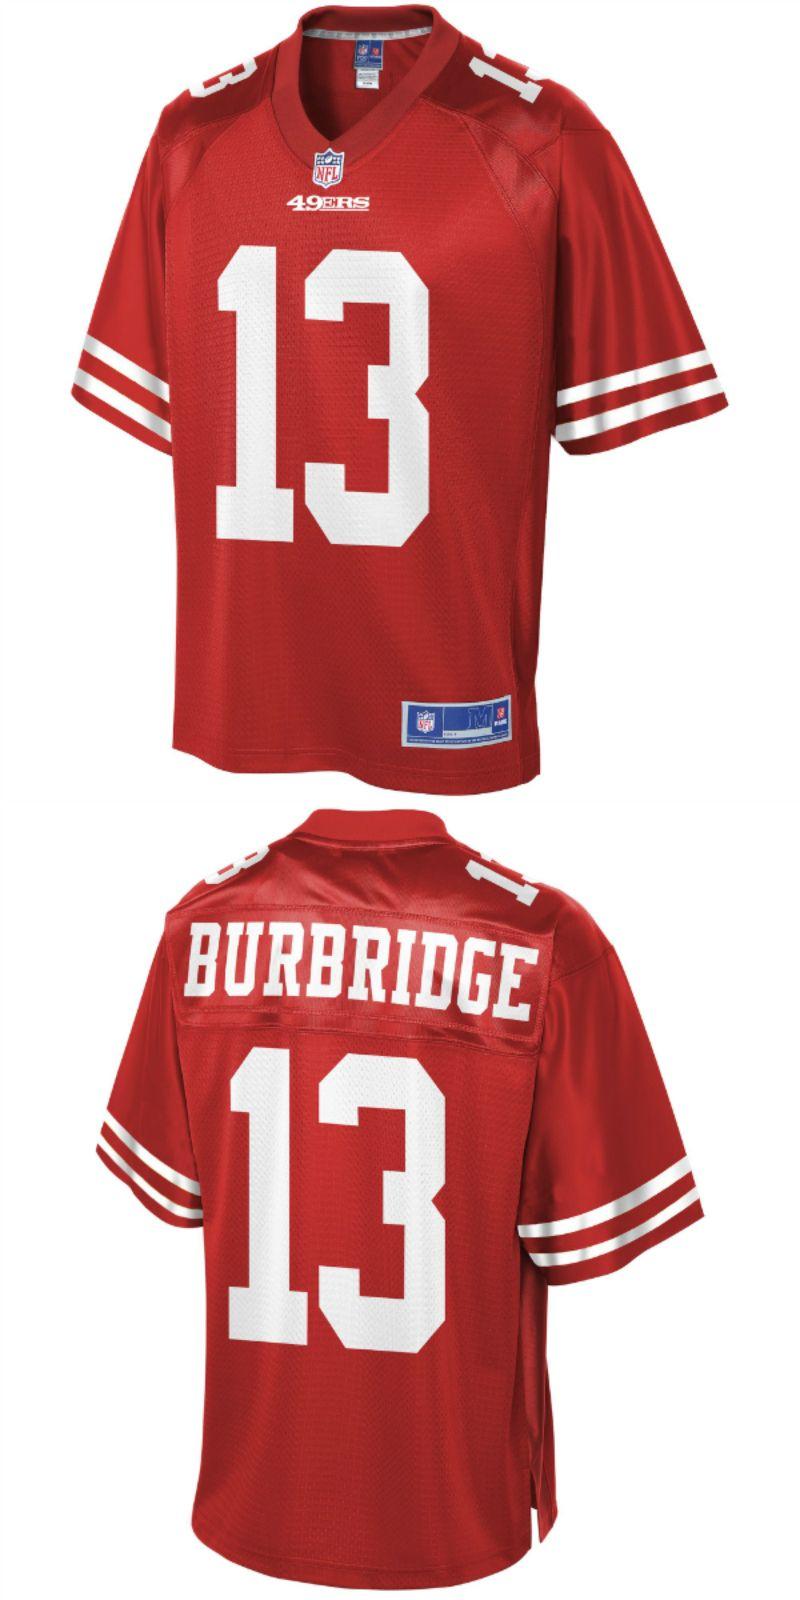 the best attitude a4688 5c122 Aaron Burbridge San Francisco 49ers NFL Pro Line Team Player ...